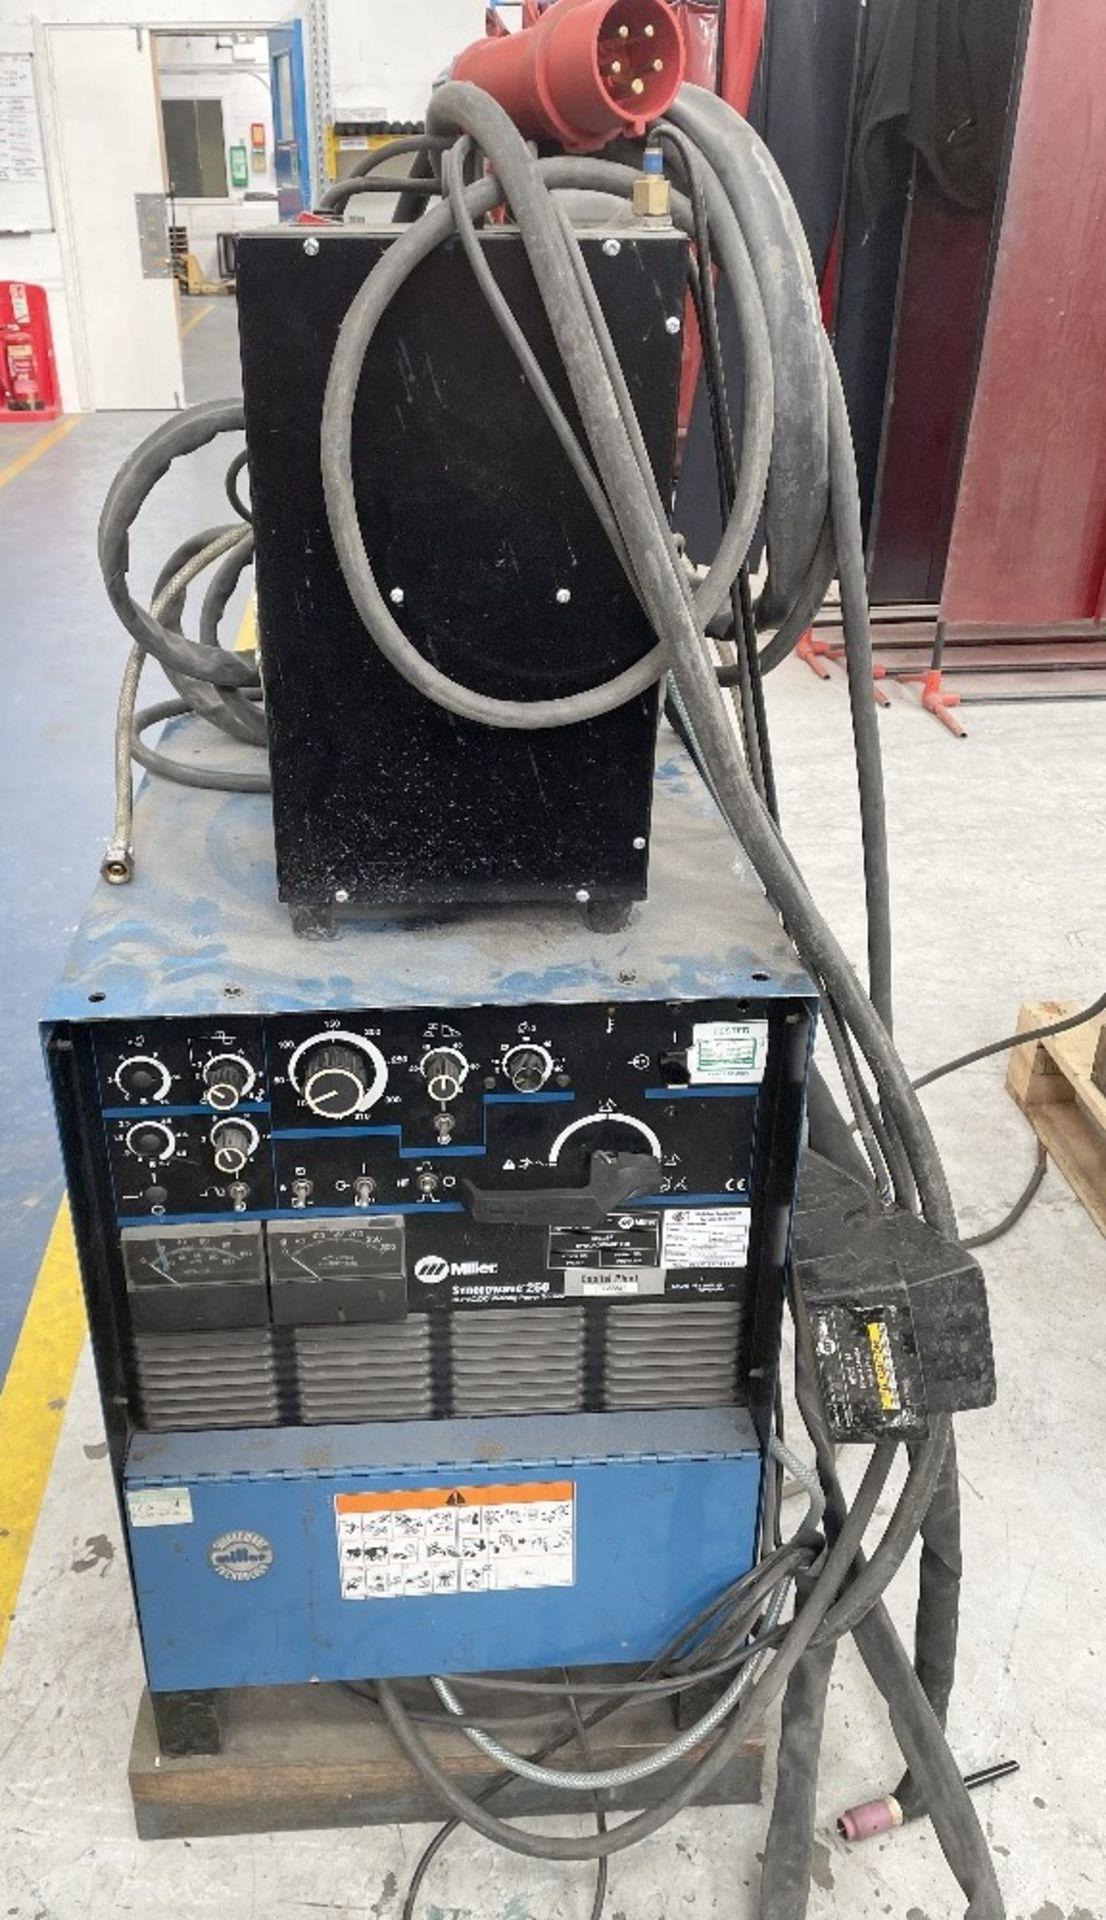 Miller Syncrowave 250 Tig Welder w/ TecArc XC1000 Water Cooler & Foot Pedal